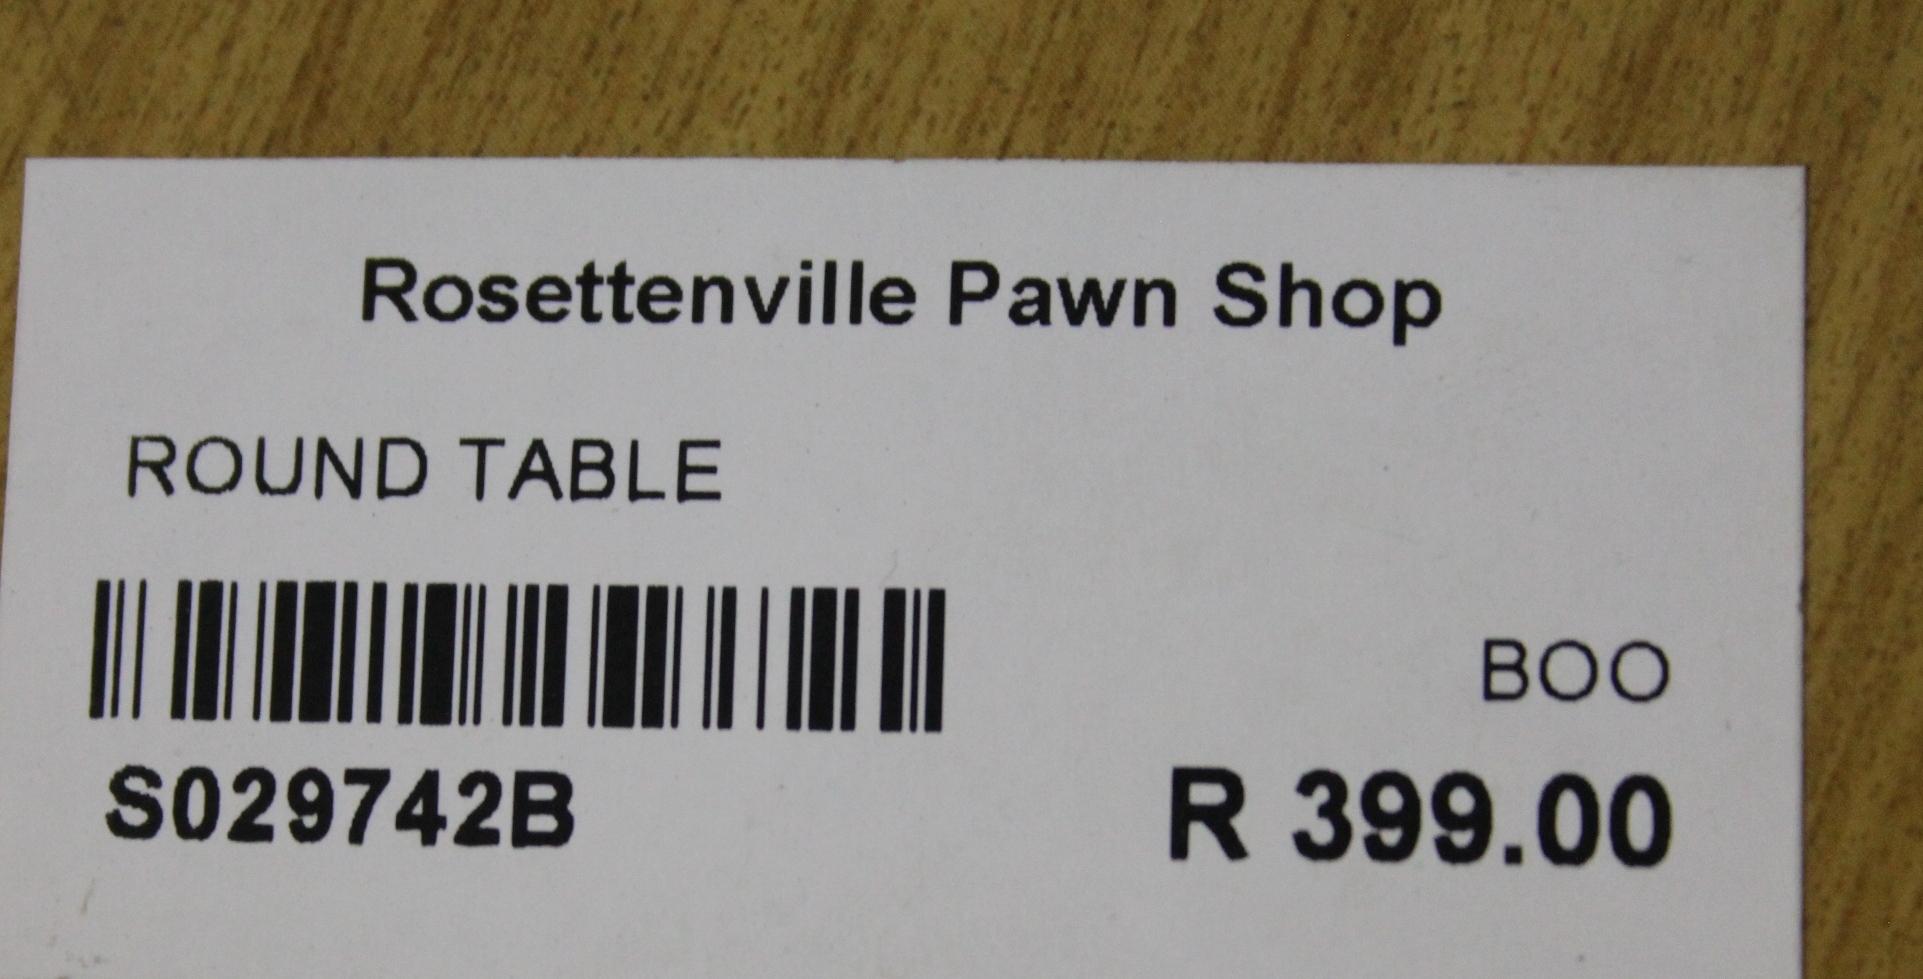 Round table s029742b #Rosettenvillepawnshop